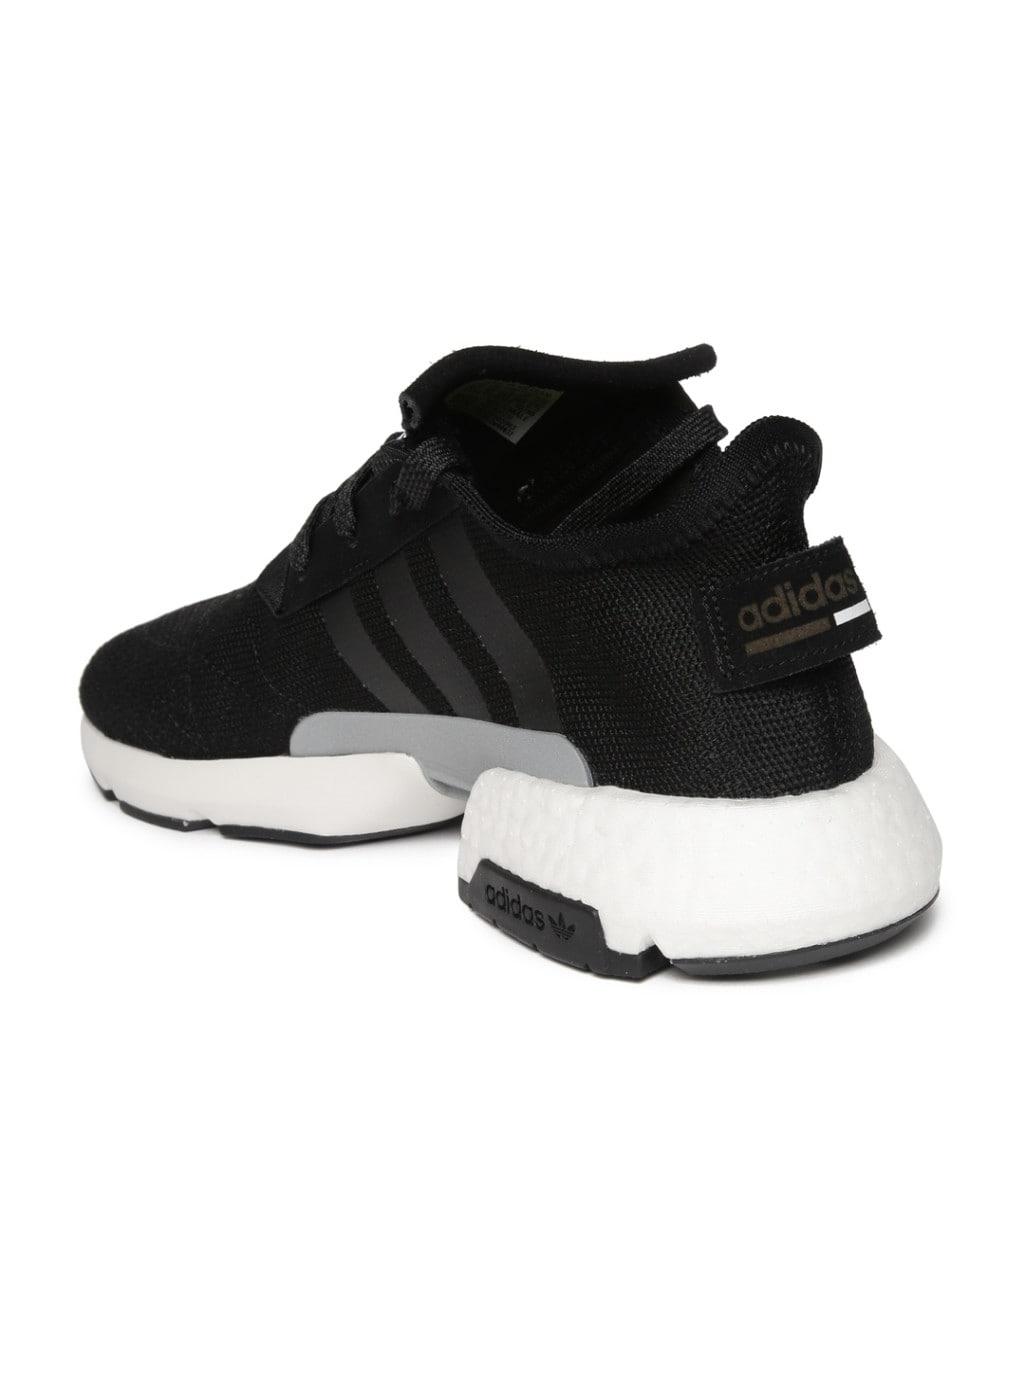 1215d62314e6 Adidas Originals - Buy Adidas Originals online in India - Jabong